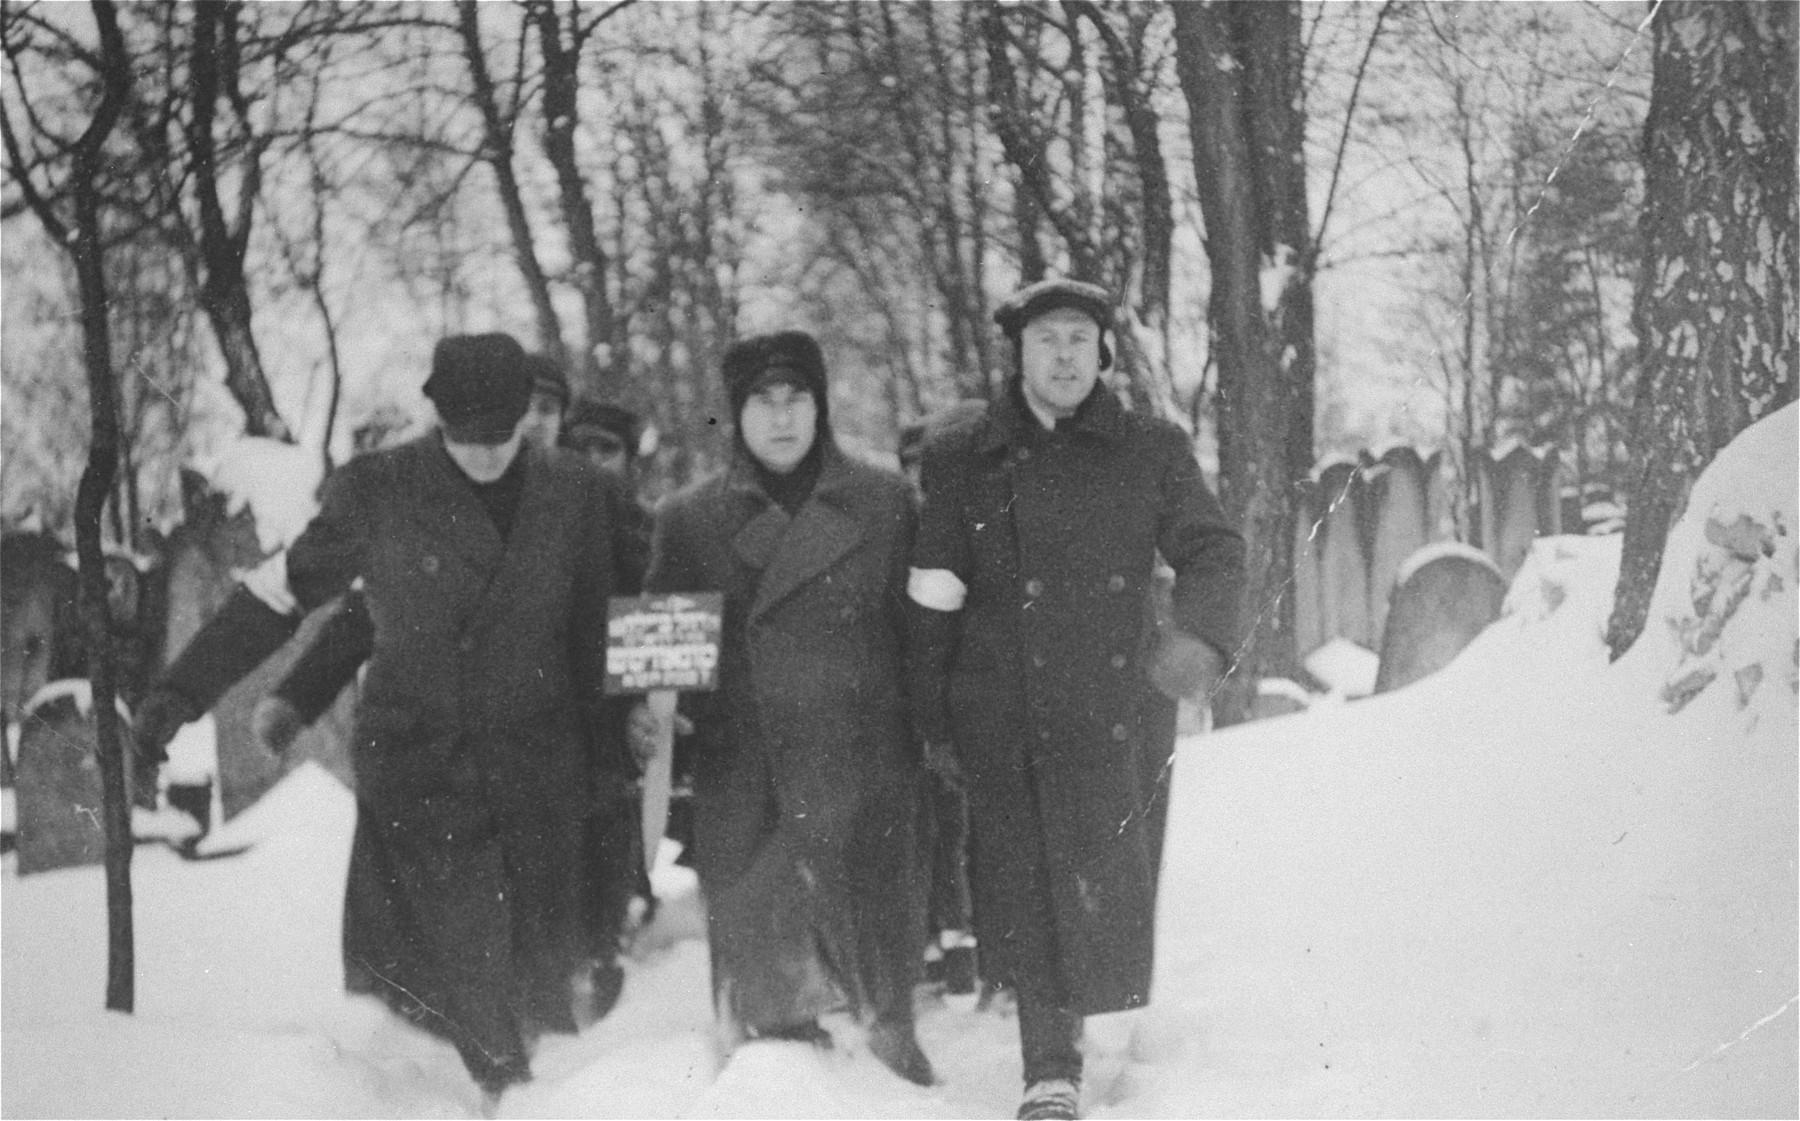 Funeral of Rachel Baila Munowicz at the Jewish cemetery in Czestochowa.  Rachel Munowicz is the grandmother of the donor.